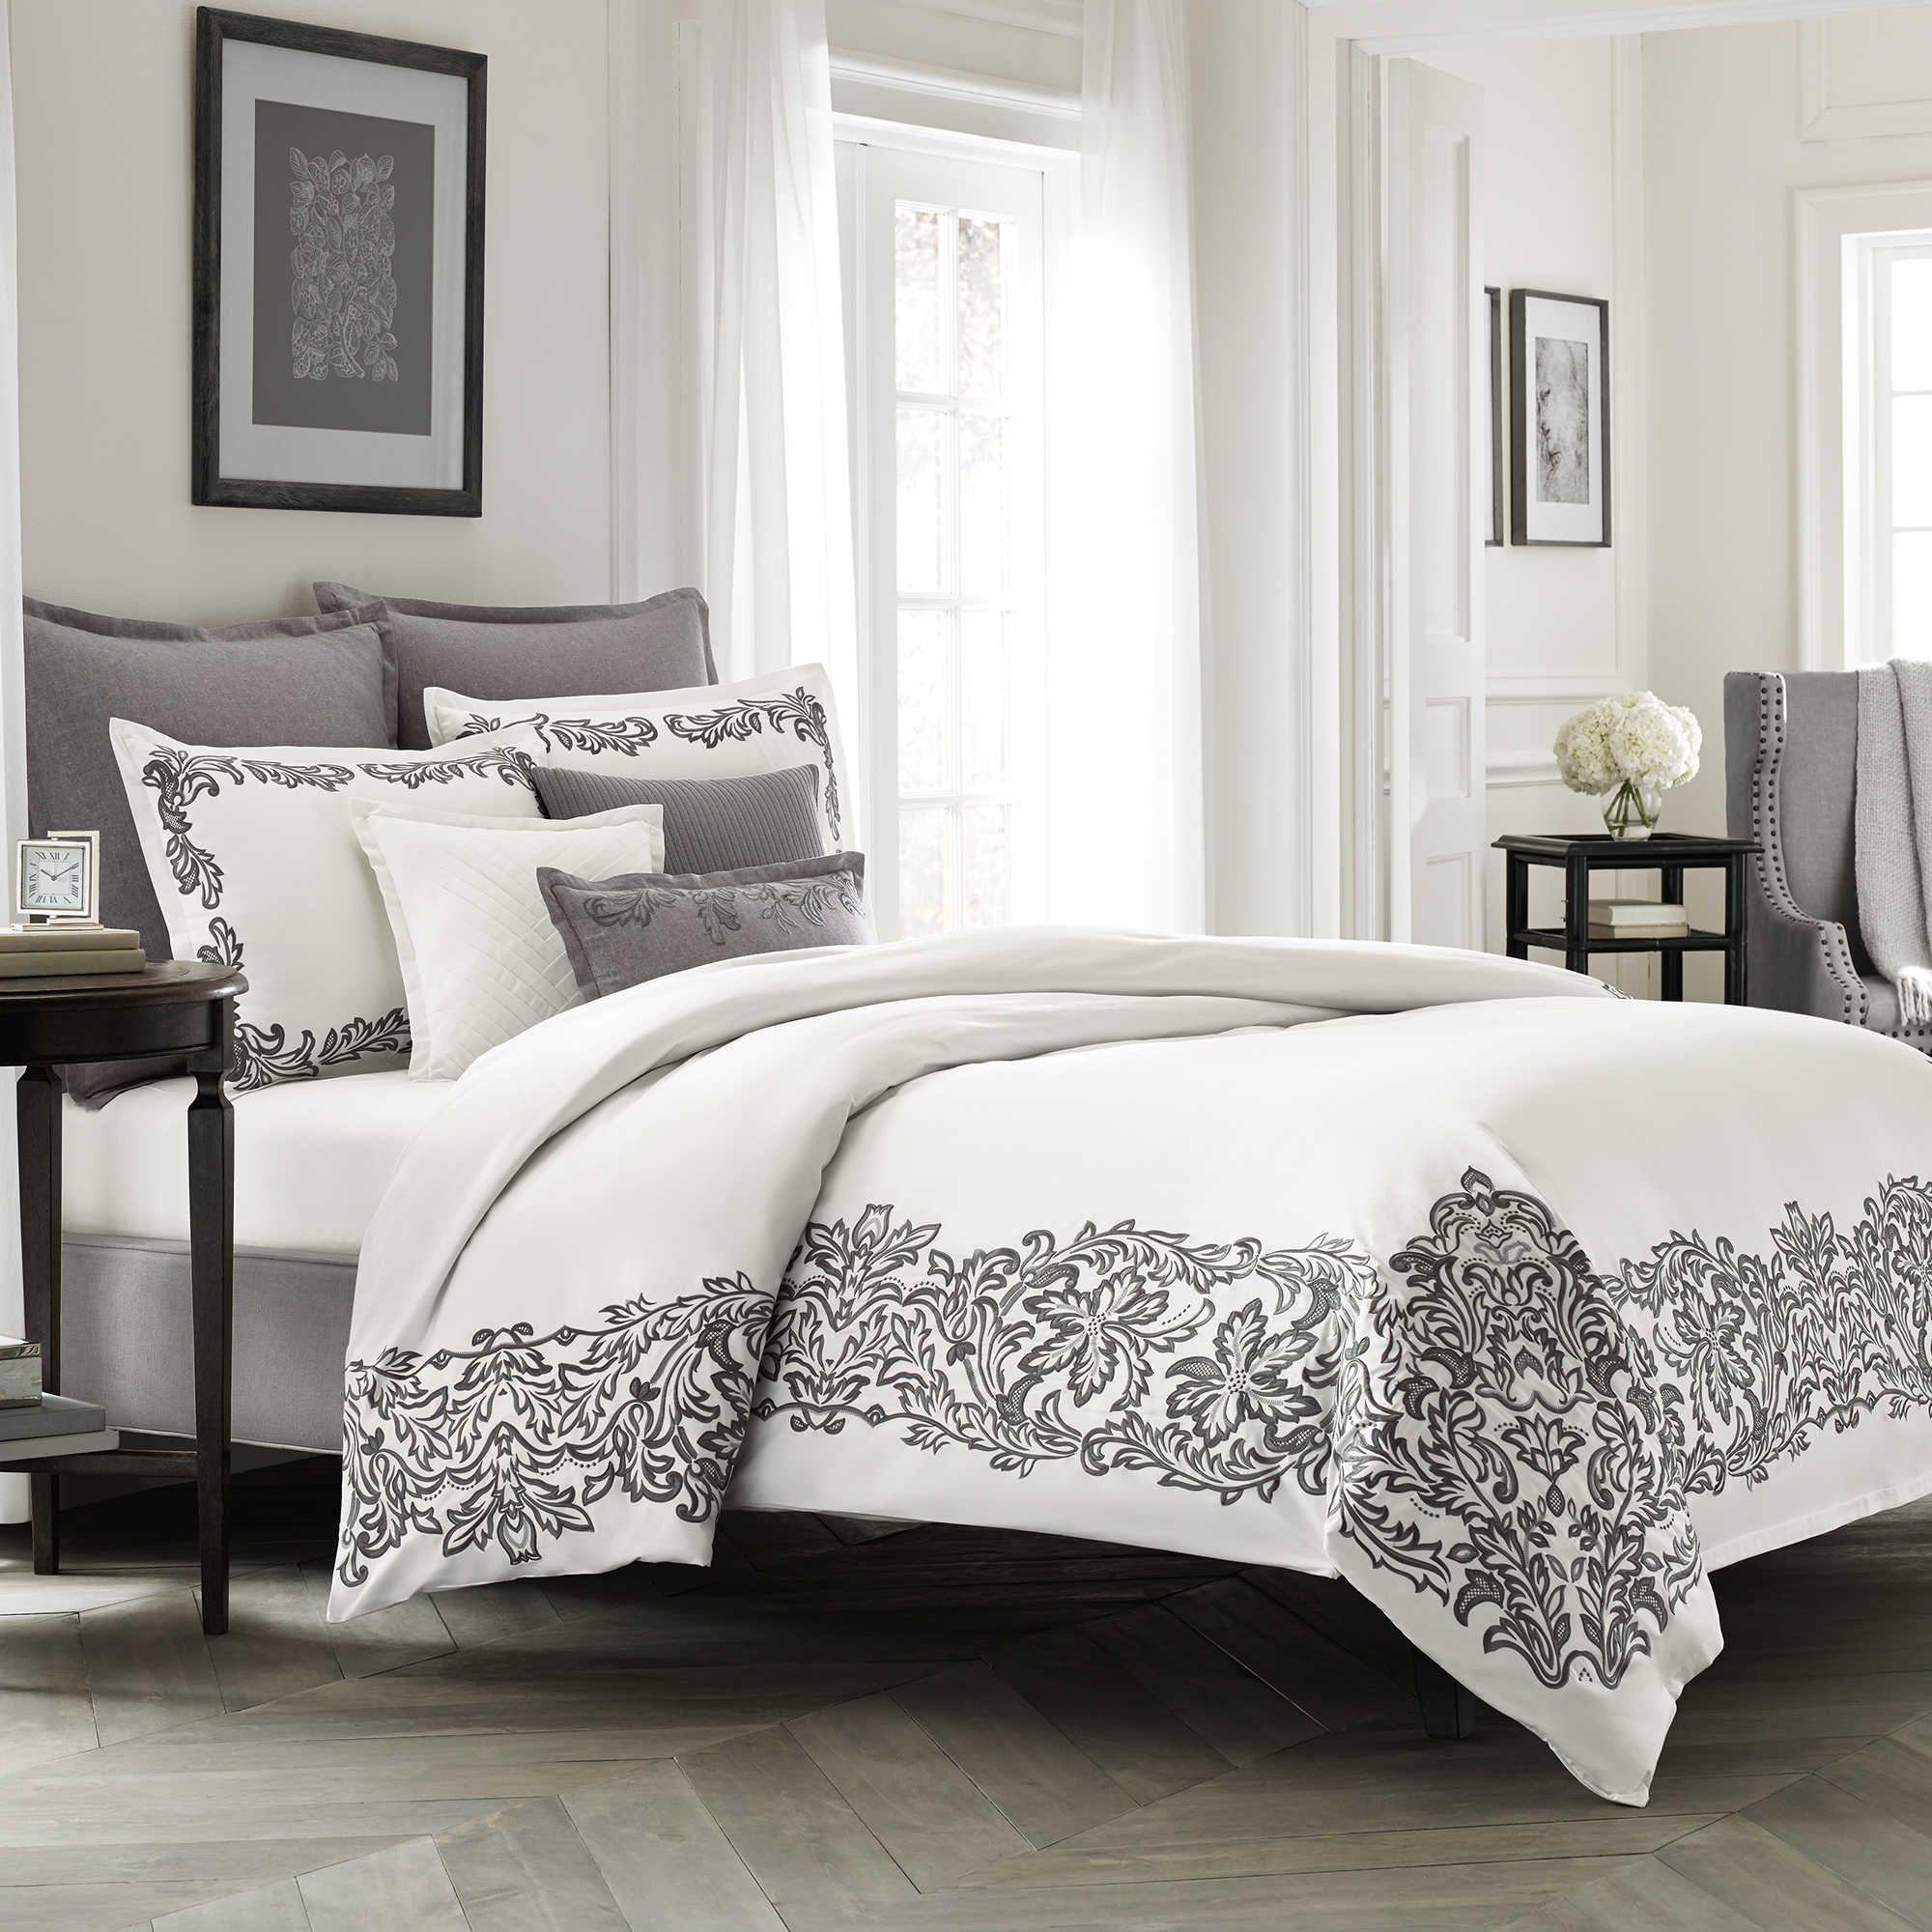 Wamsutta Collection Luxury Italian Made Alisa Duvet Cover in White